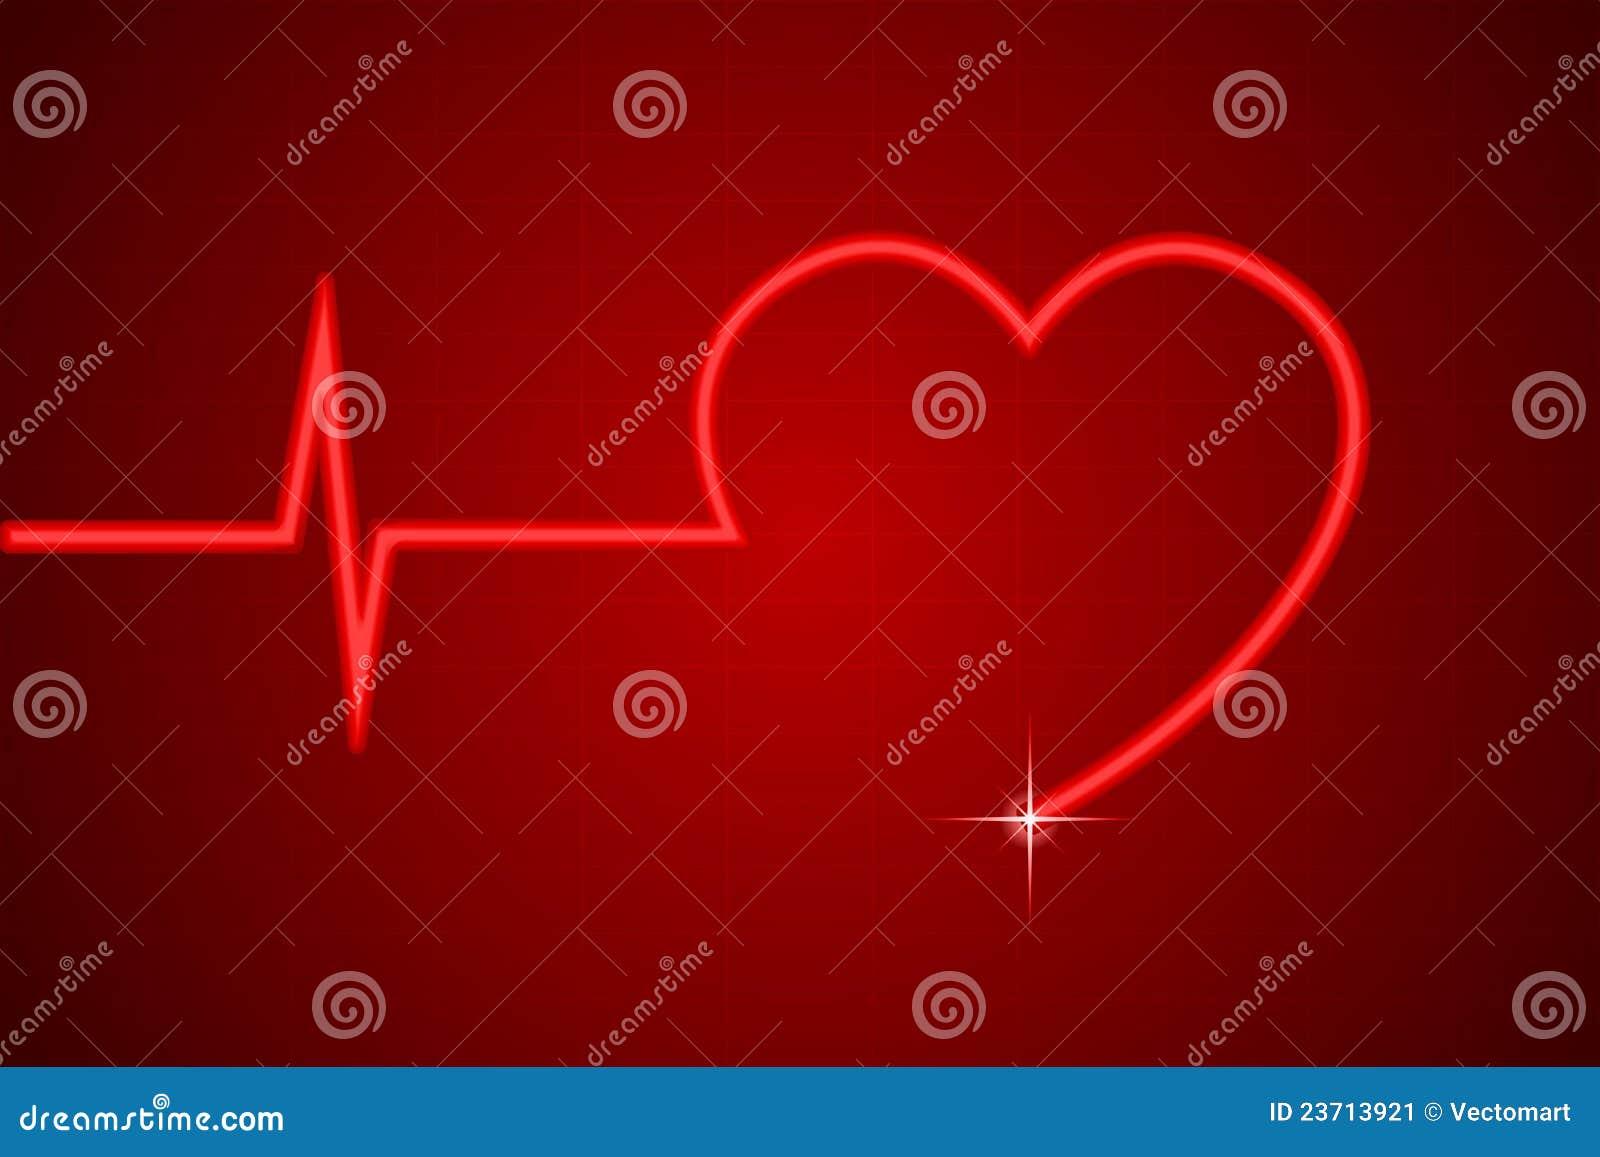 heart line stock image